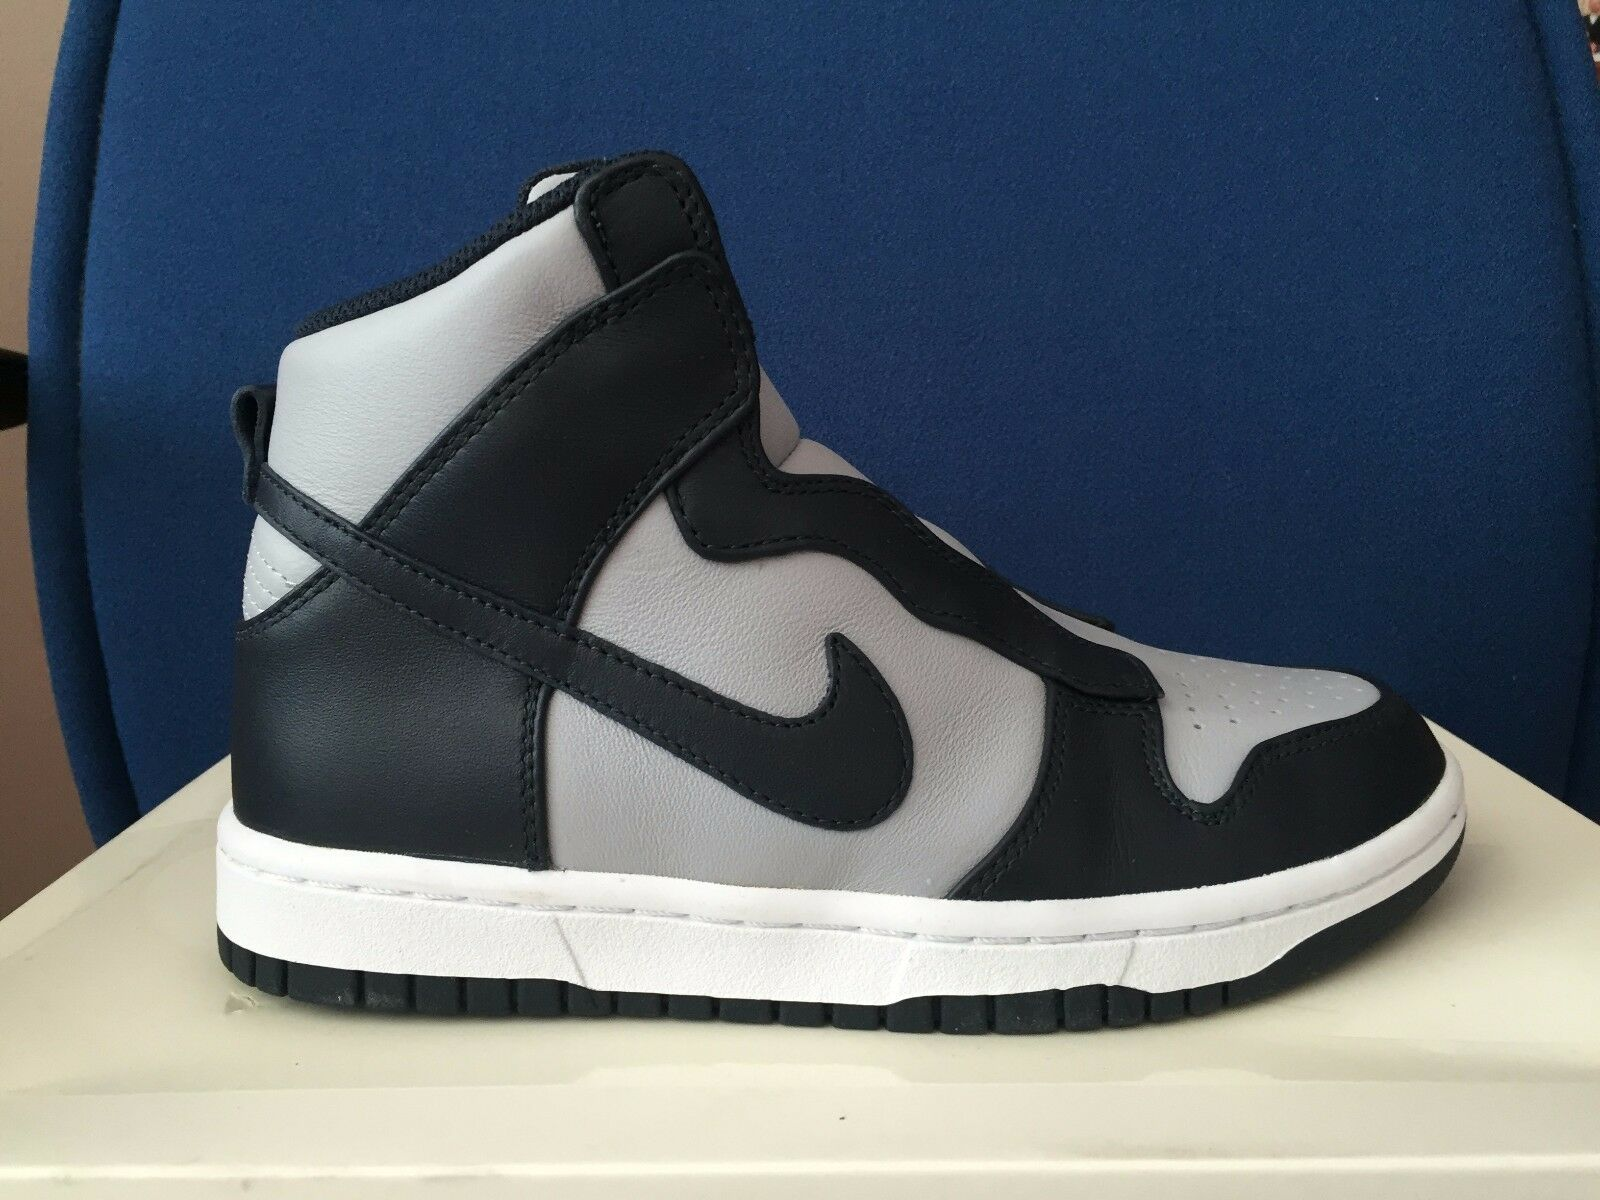 200 Womens Womens Womens Nike NikeLab x Sacai Dunk Lux Sz 5.5 Grey Navy bluee White 776446 440 707f4f